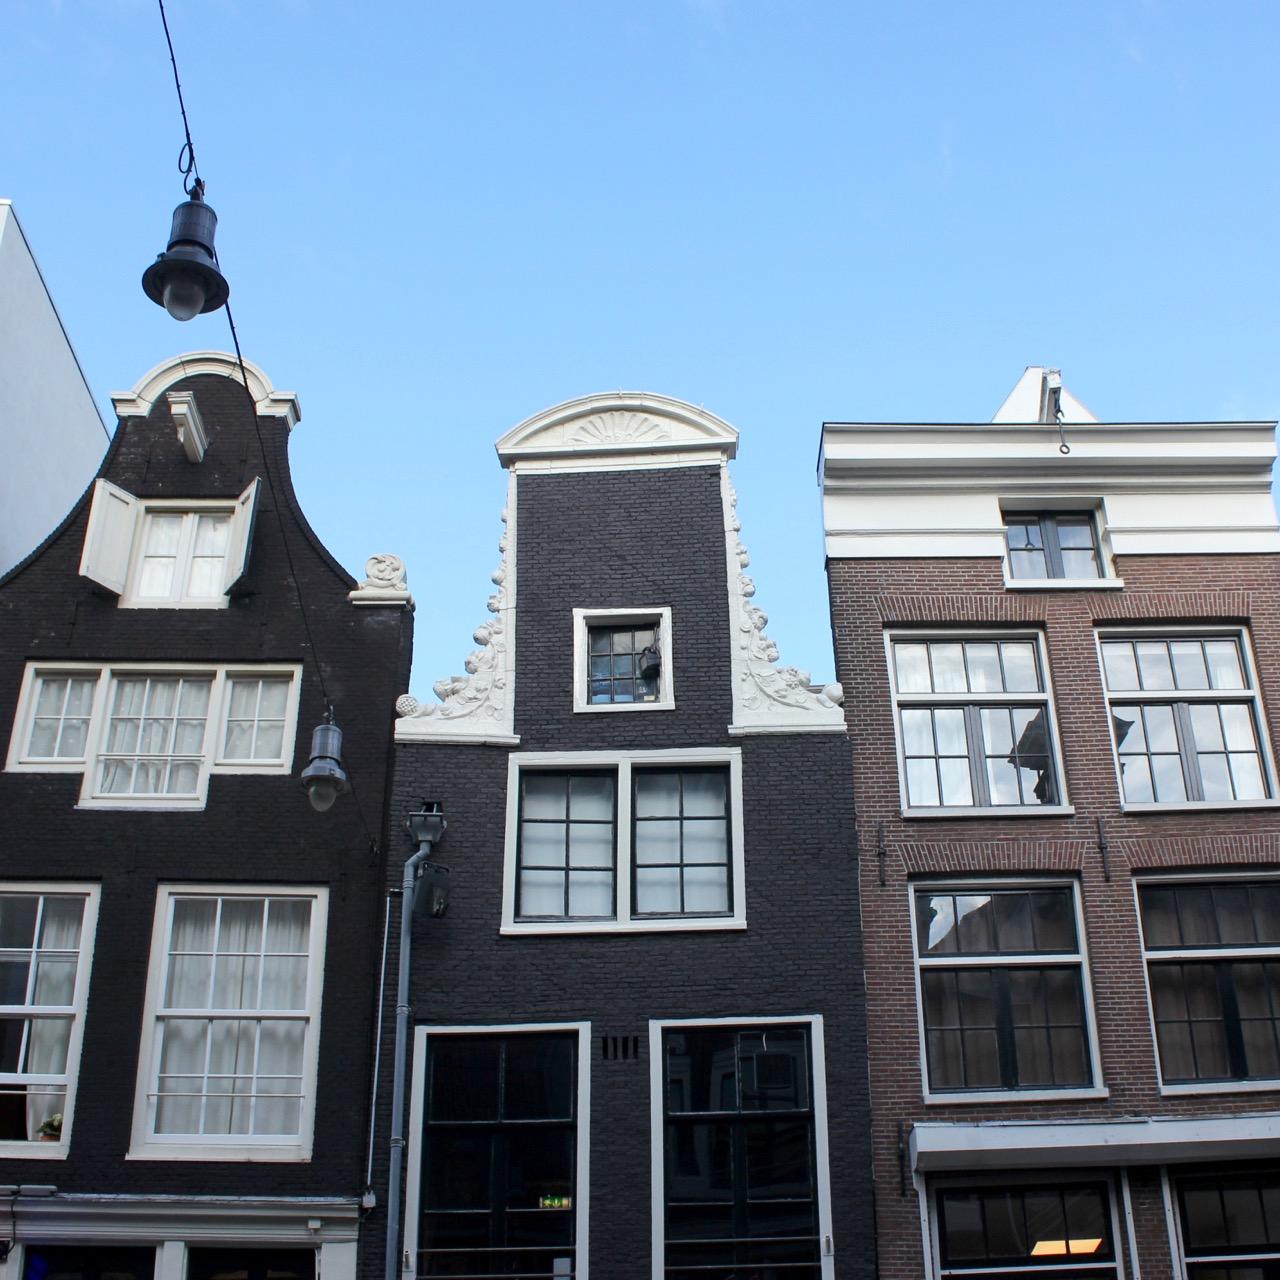 Amsterdam, Netherlands - 10